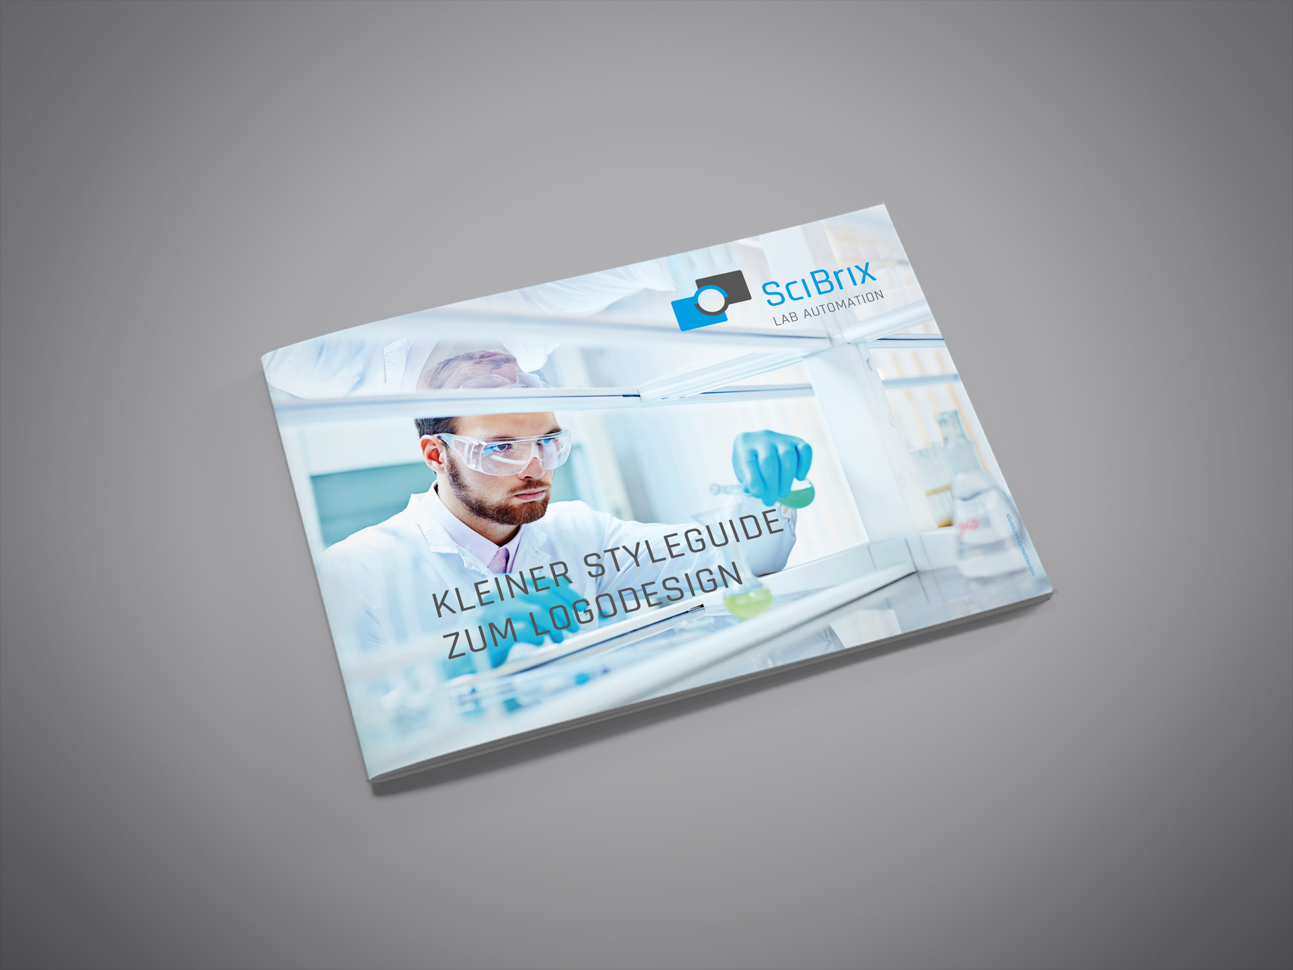 martin_zech_design_corporate_design_SciBrix-lab-automation_styleguide_cover